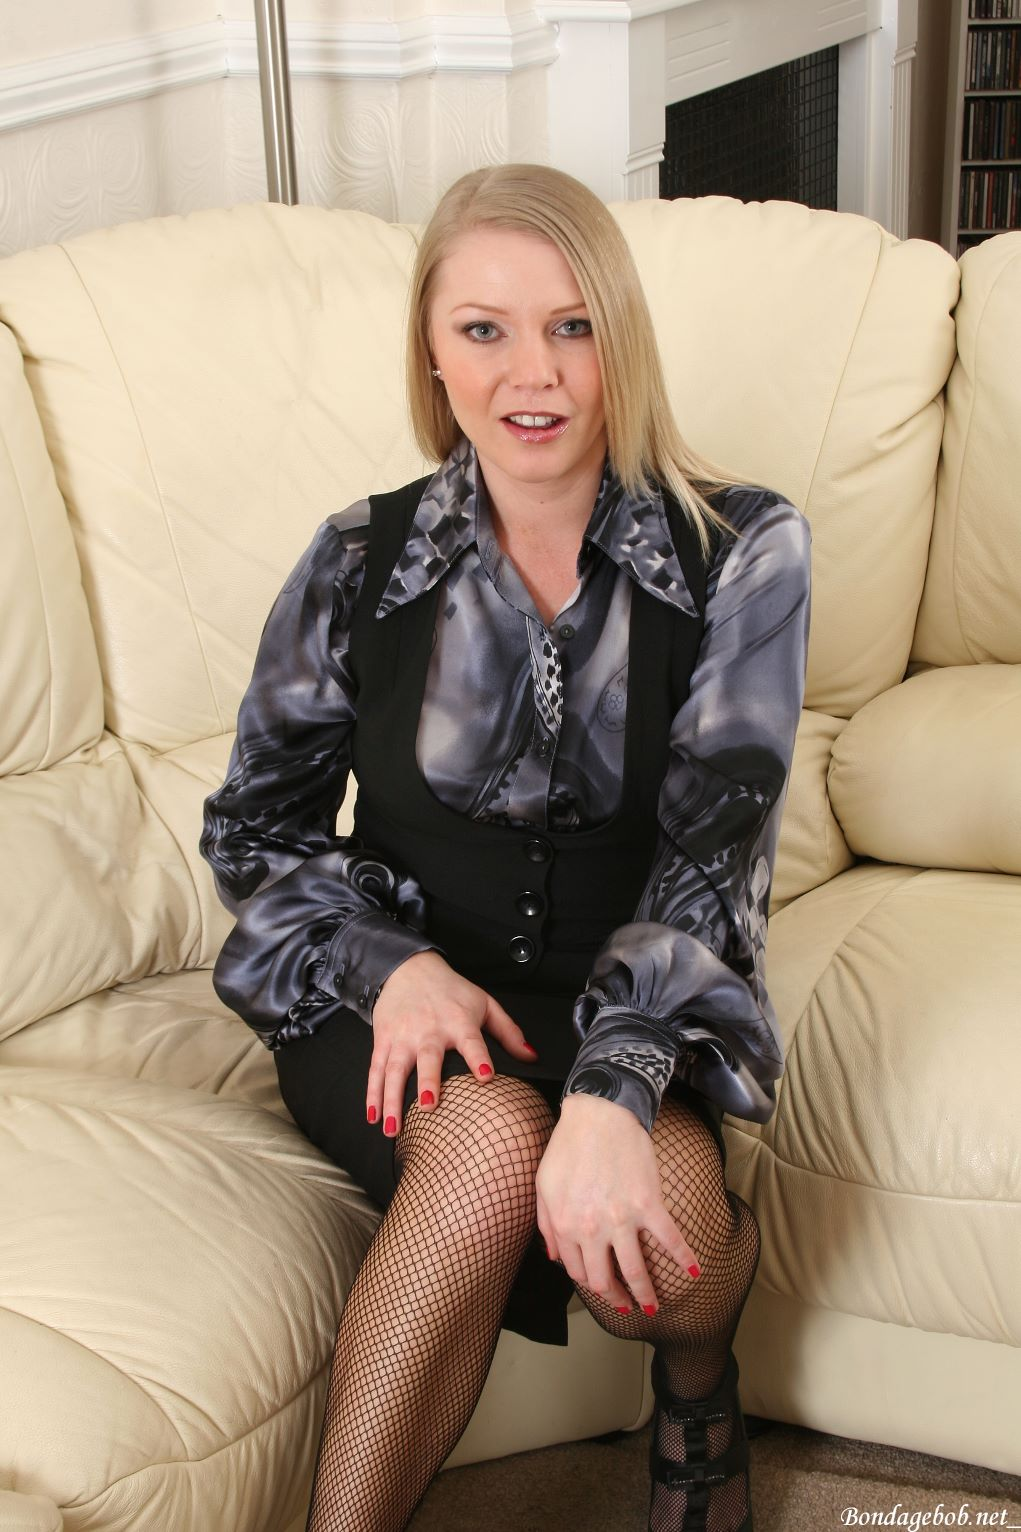 Abigail Toyne in a blouse posing.